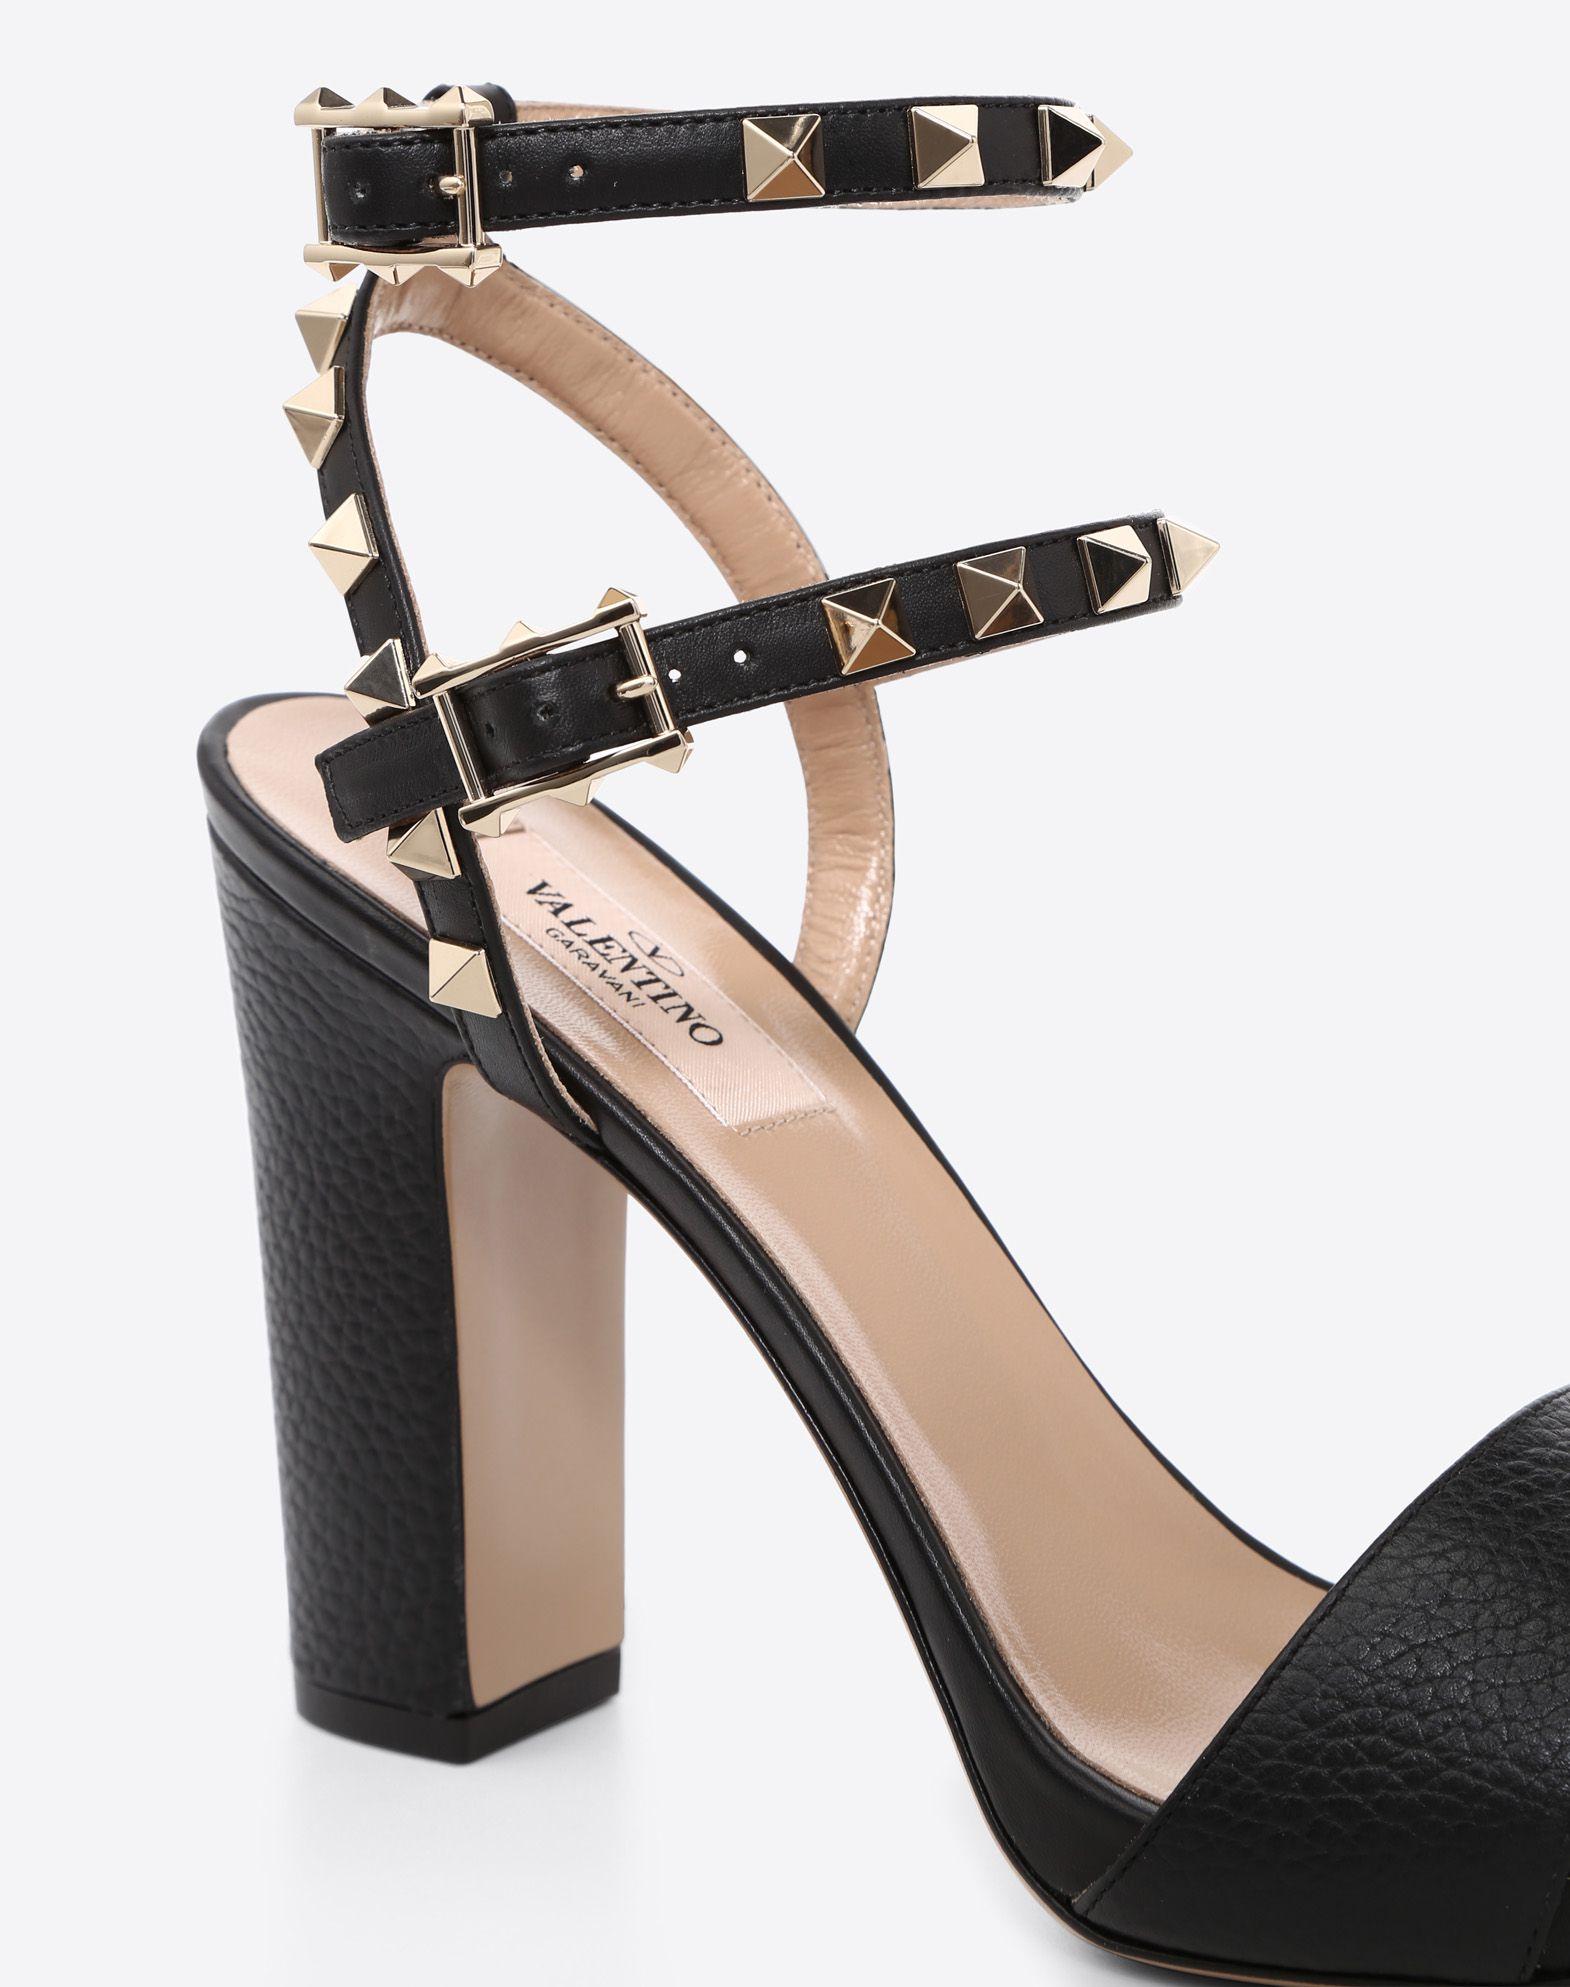 VALENTINO GARAVANI Rockstud Sandal HIGH HEEL SANDALS D b